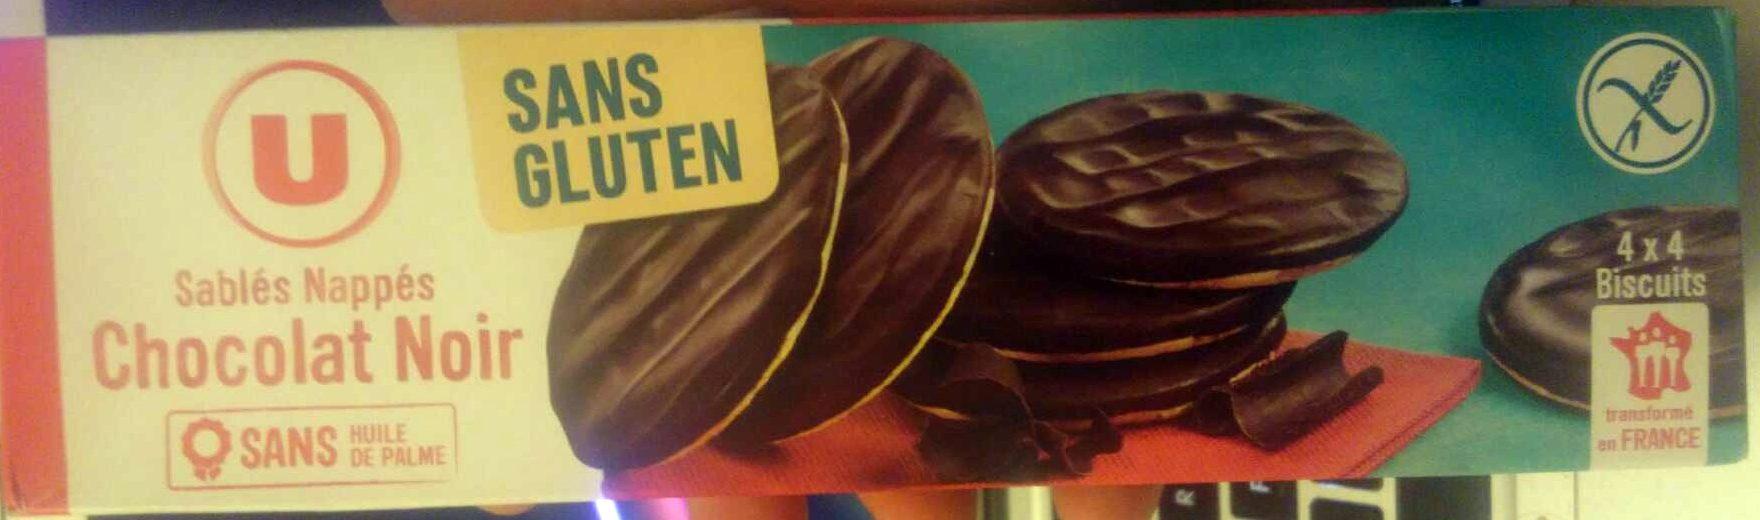 Sablés nappés chocolat noir - Product - fr